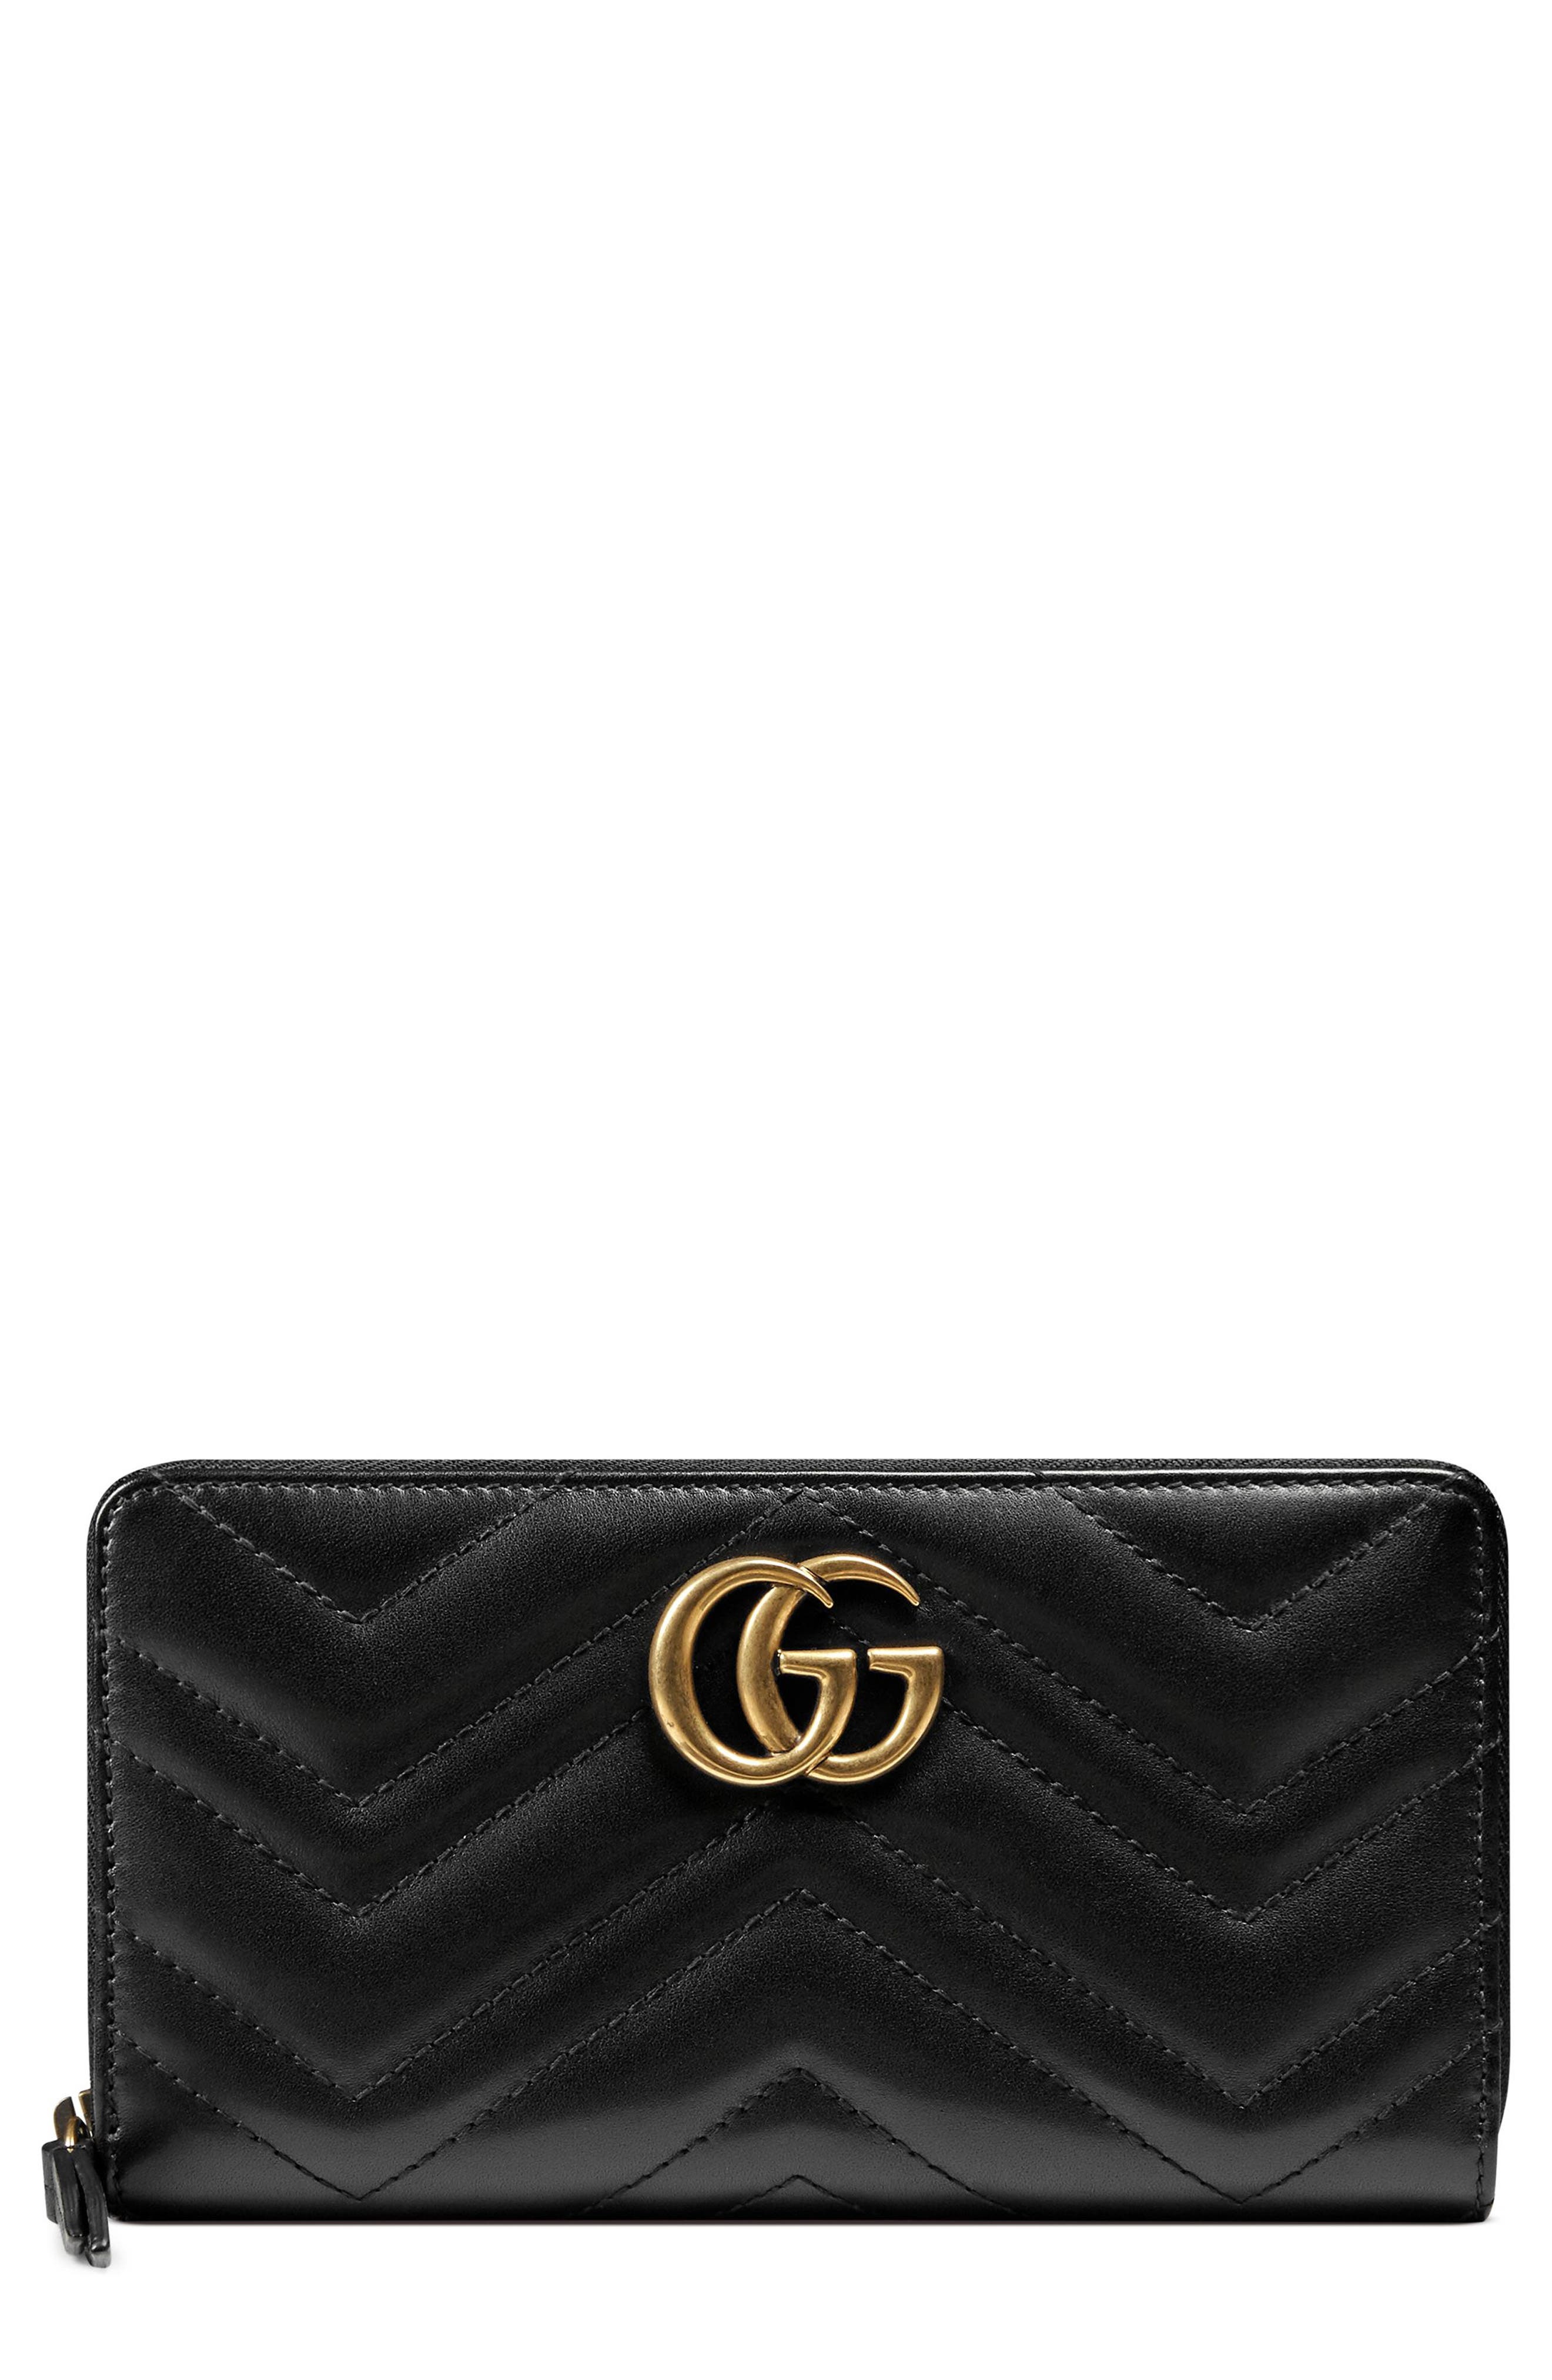 GUCCI, GG Marmont Matelassé Leather Zip-Around Wallet, Main thumbnail 1, color, NERO